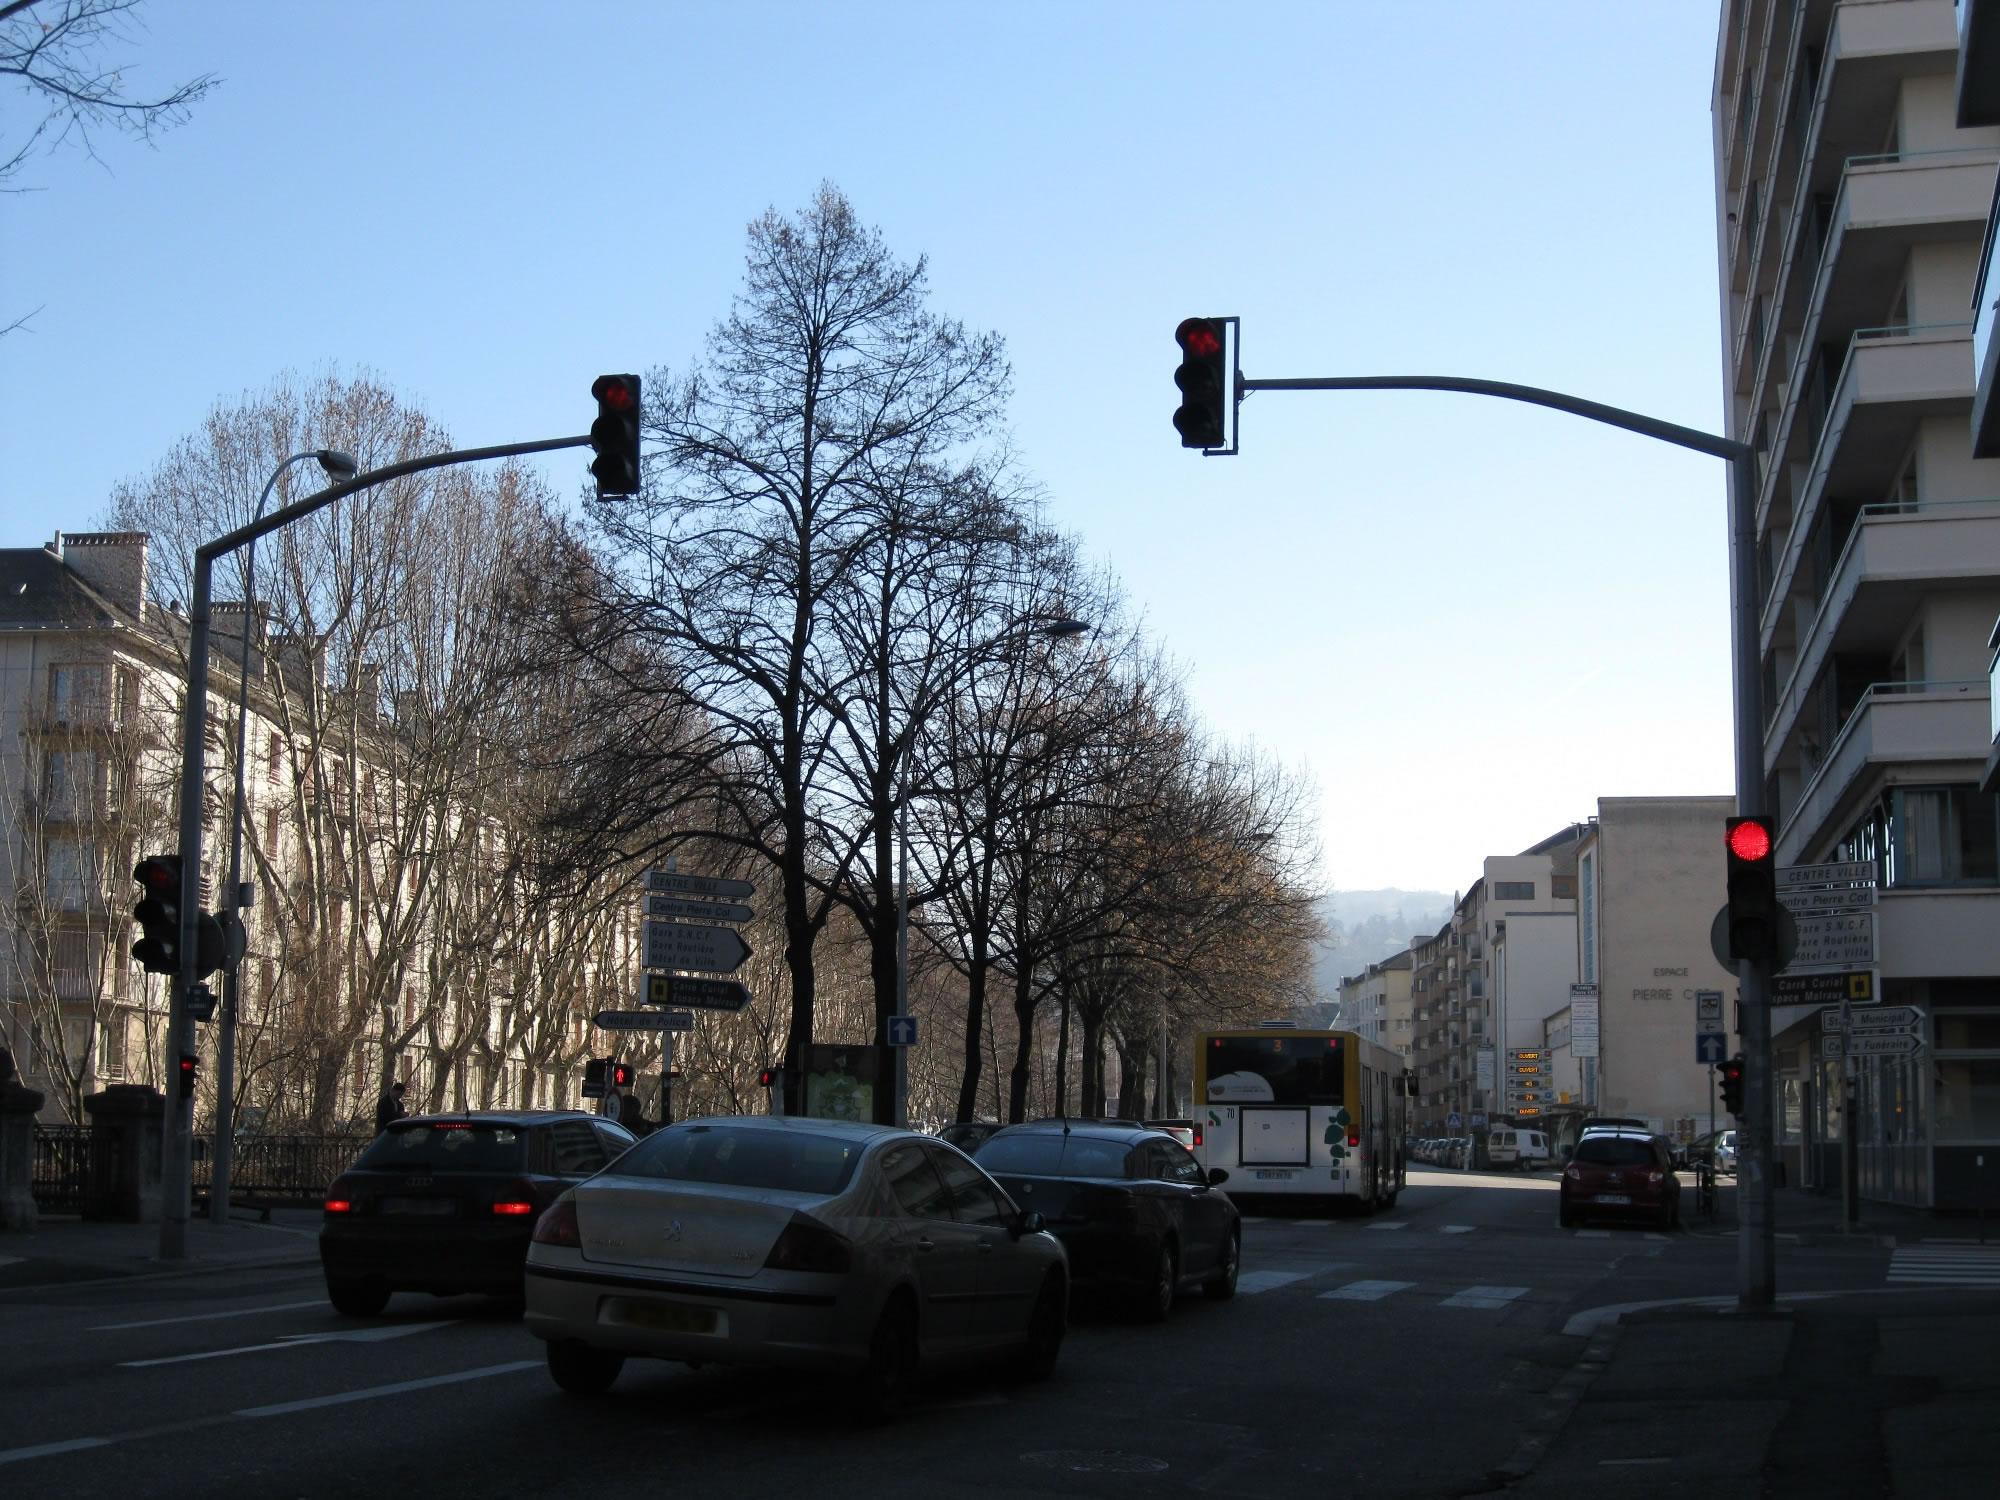 France Trafficlights Jpg